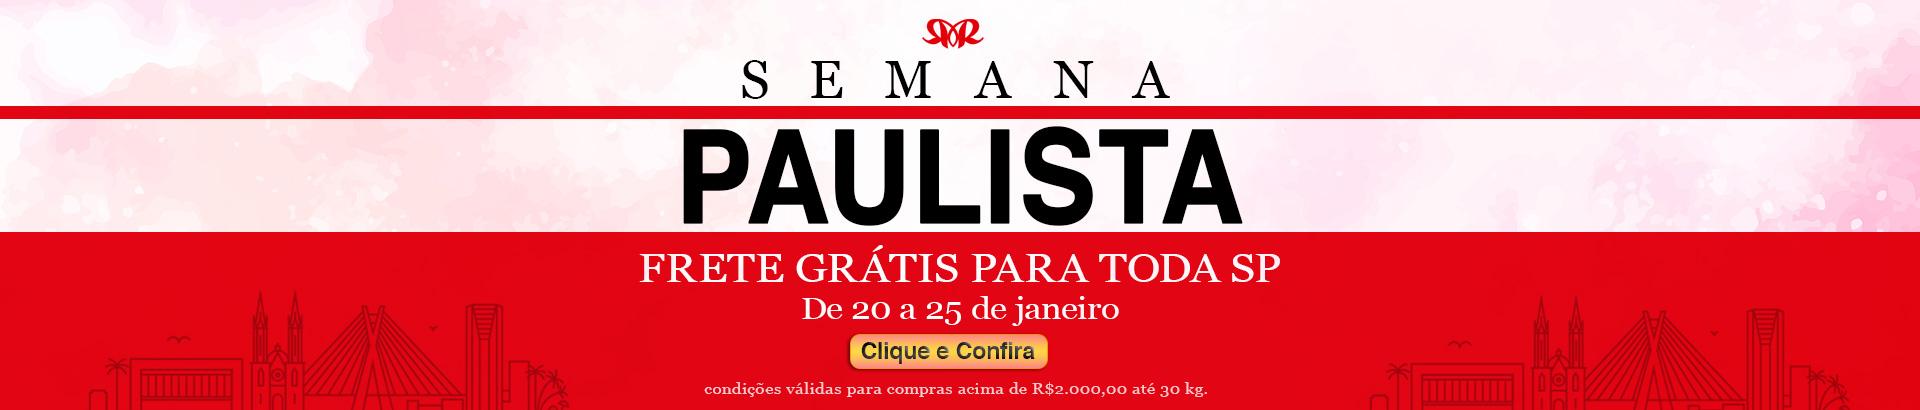 Semana Paulista